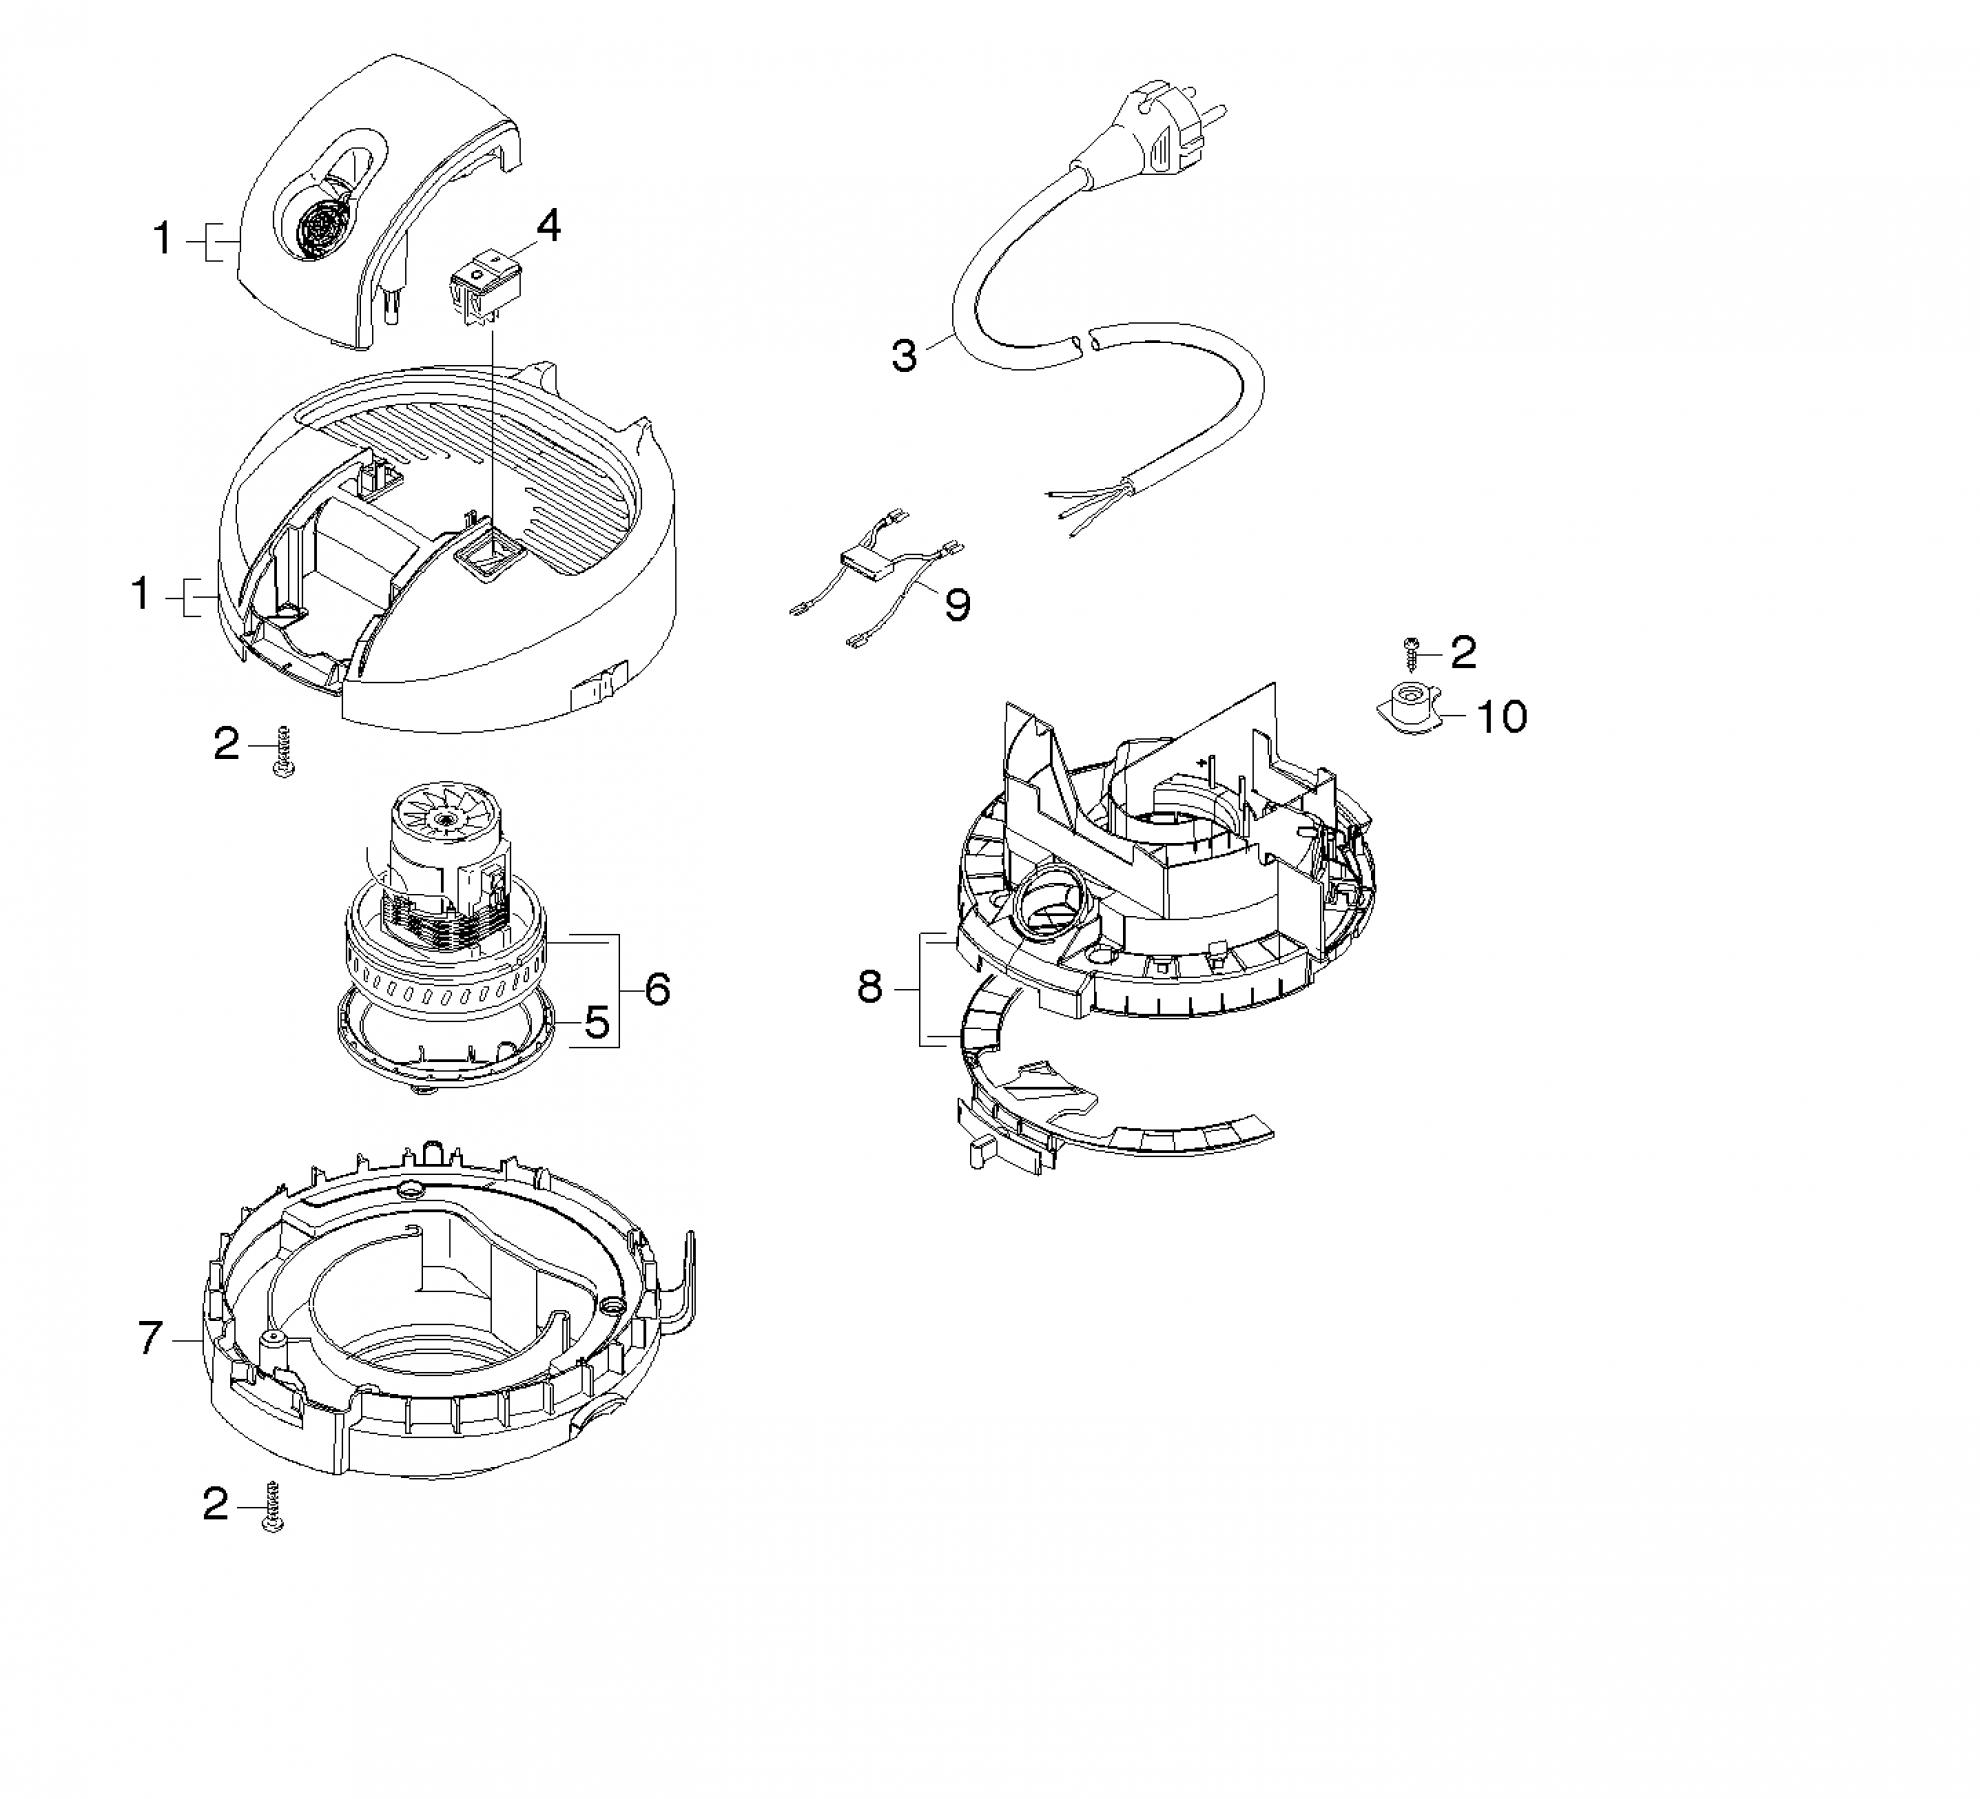 pi ces d tach es aspirateur karcher a 2204 eu. Black Bedroom Furniture Sets. Home Design Ideas